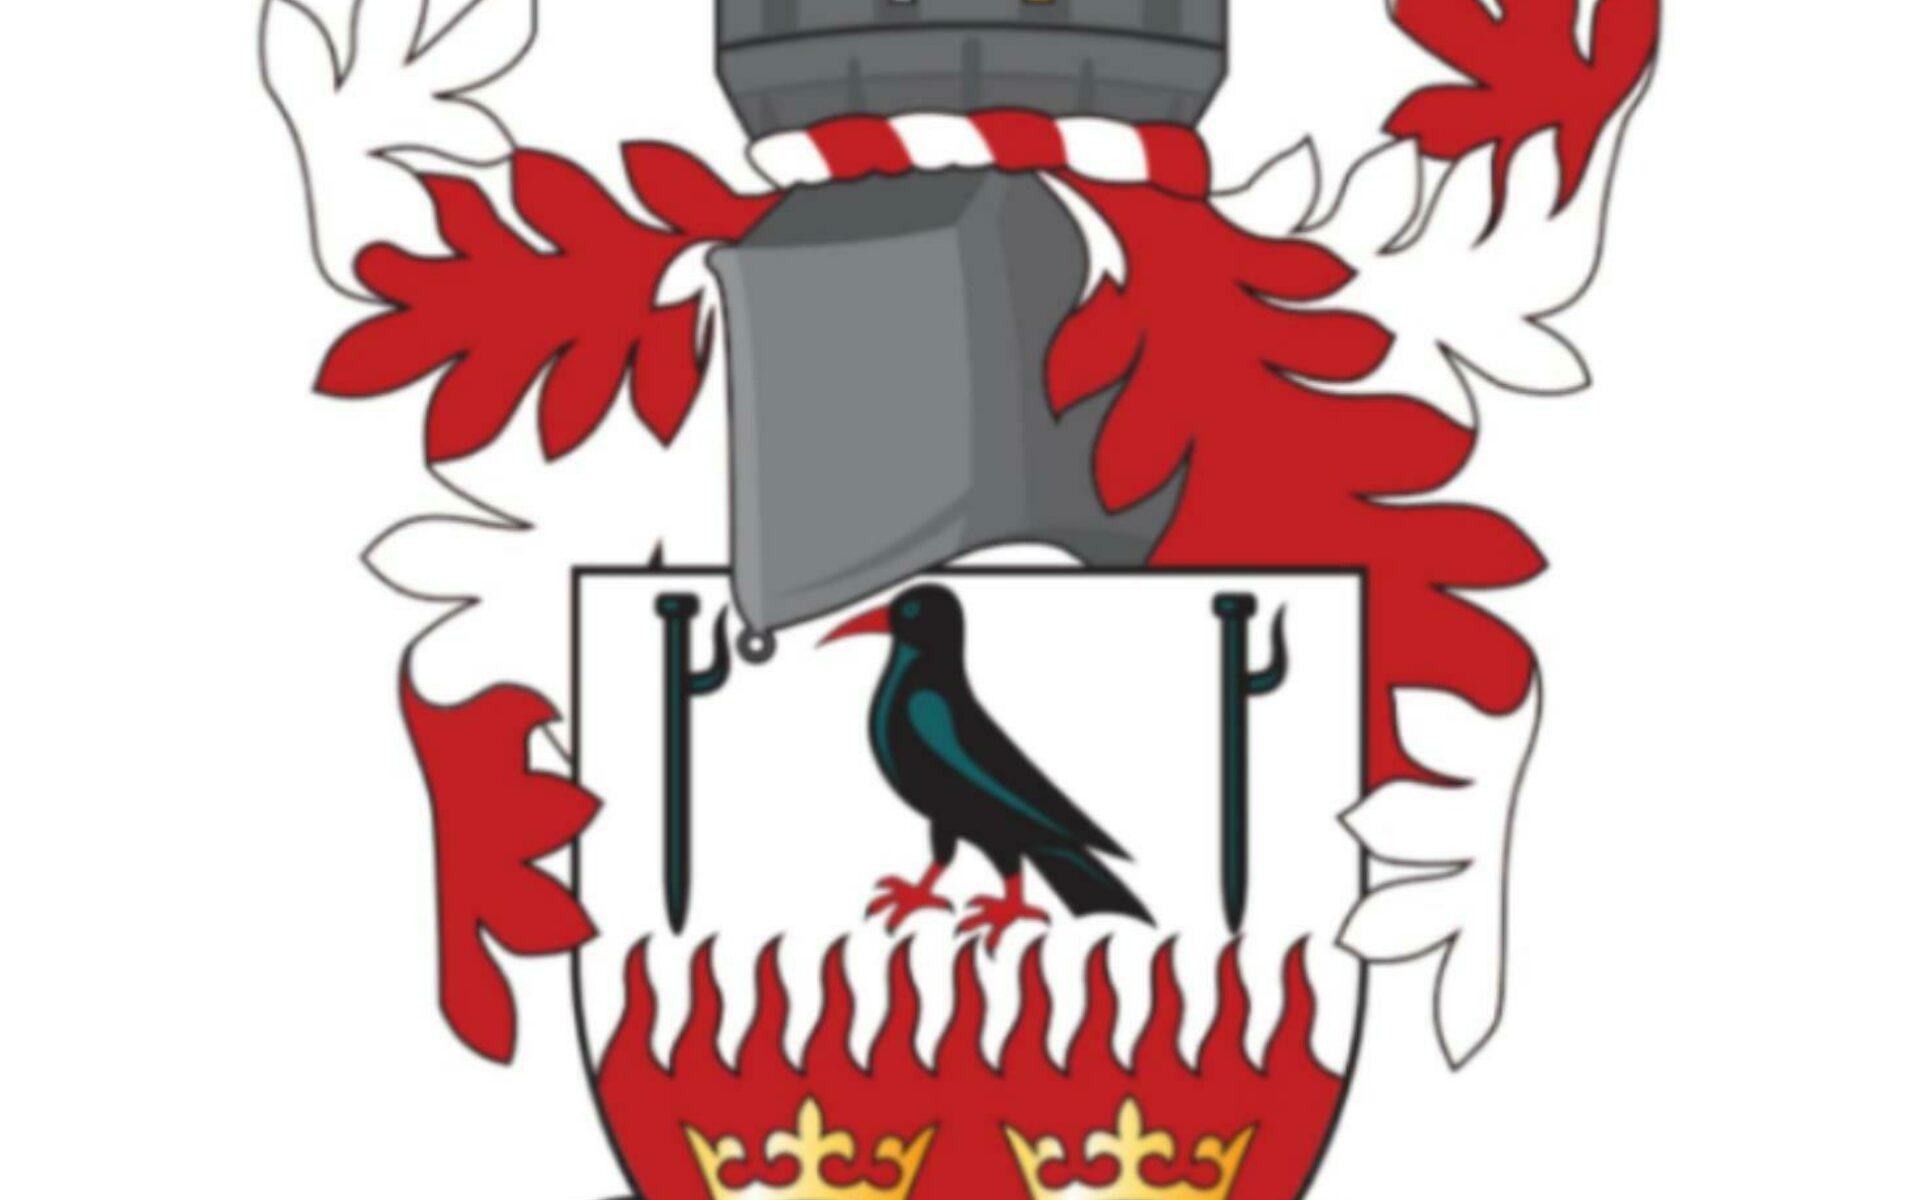 FIXTURE AND GROUND UPDATE - HULLBRIDGE FIXTURE POSTPONED Featured Image